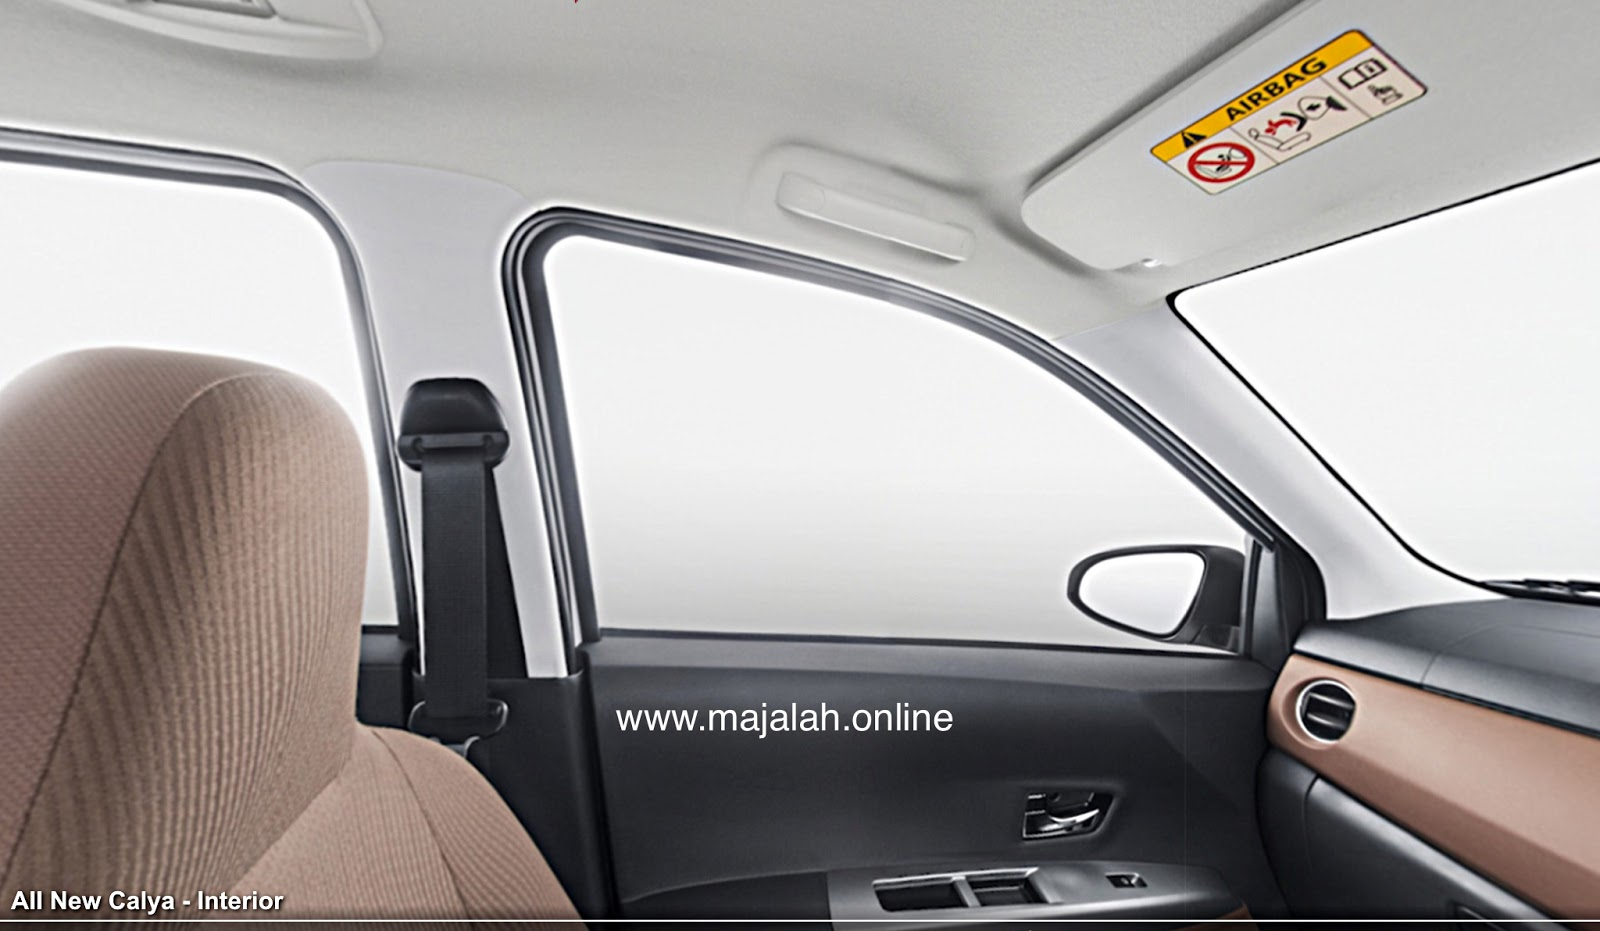 konsumsi bbm all new kijang innova diesel alphard interior mirip adik kakak dengan toyota calya melepas